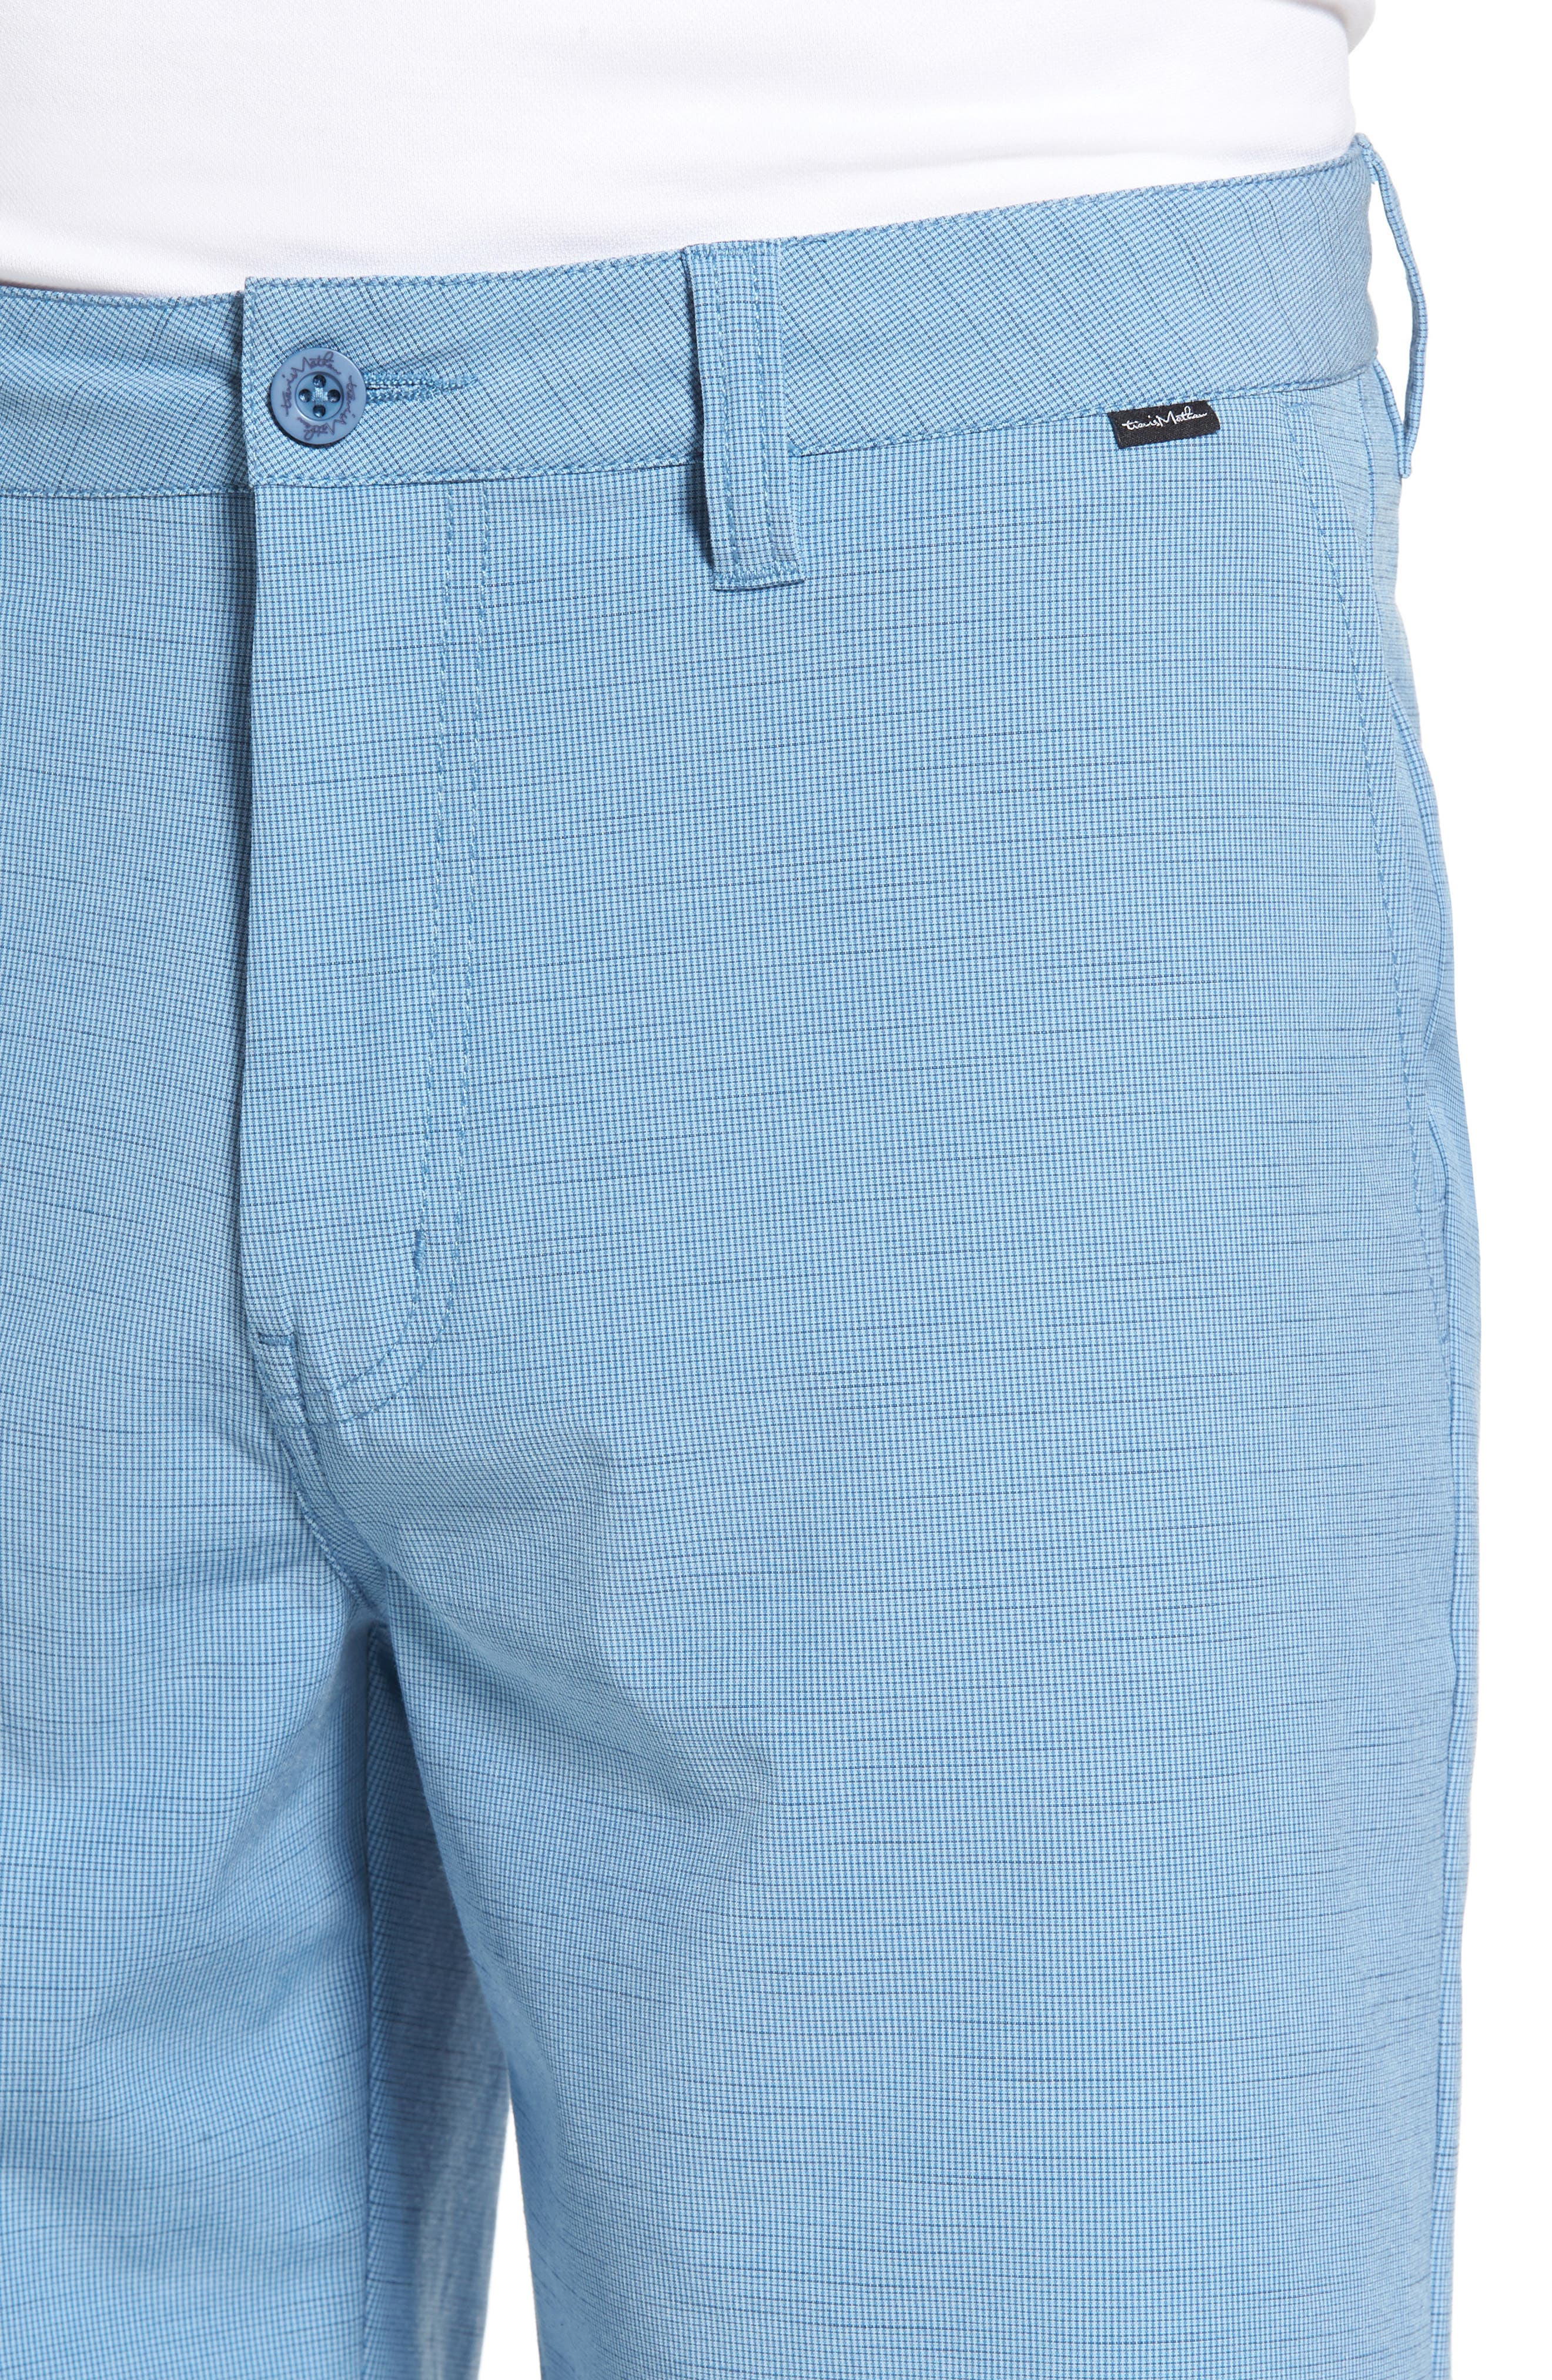 Fisher Shorts,                             Alternate thumbnail 4, color,                             401